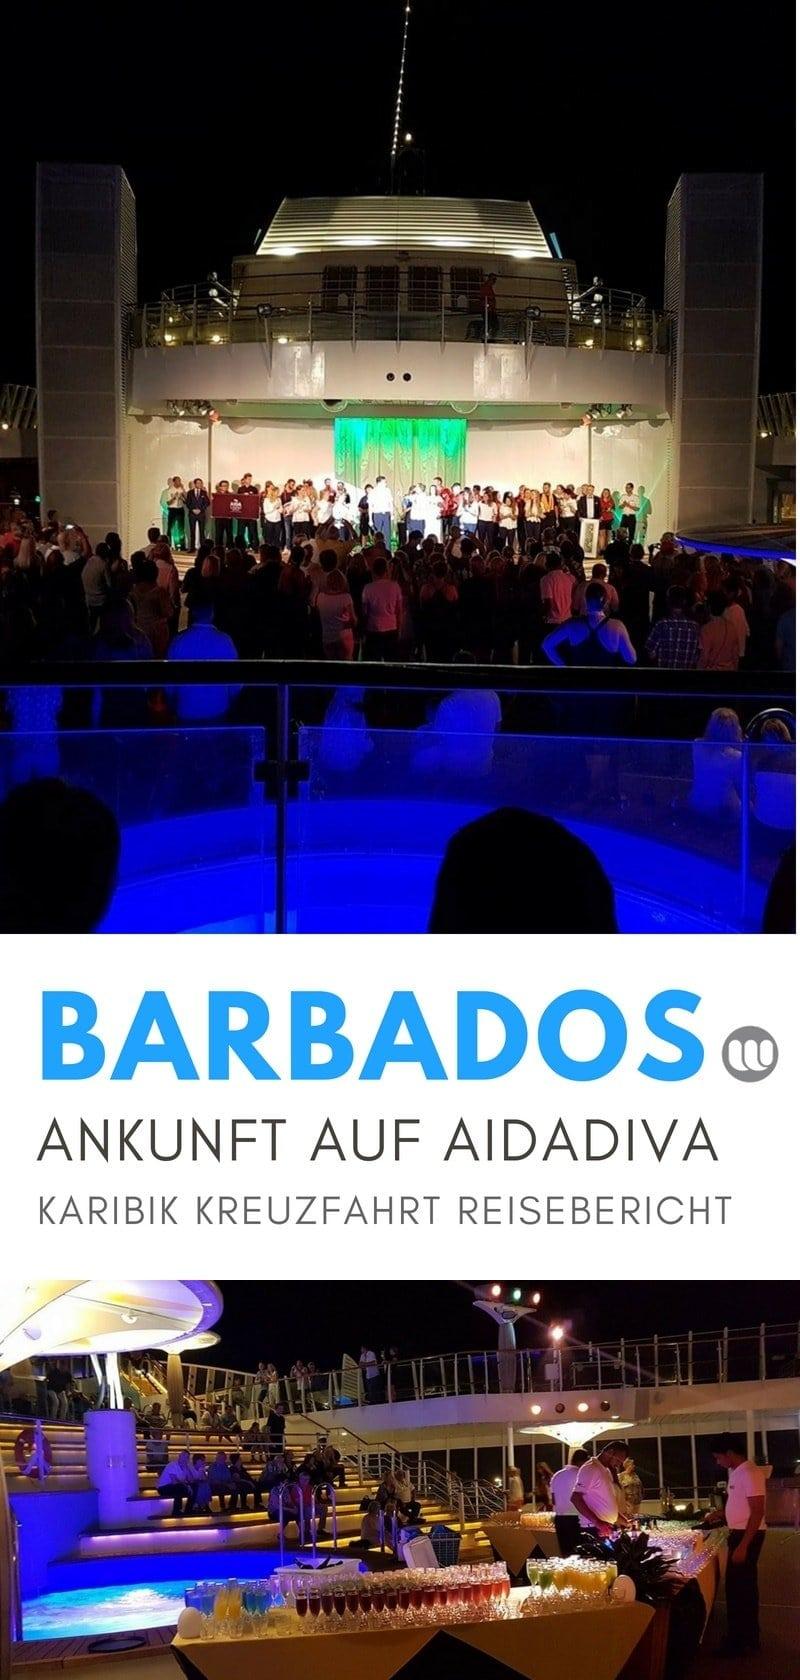 Ankunft in Barbados - Die Transatlantik Kreuzfahrt beginnt 29